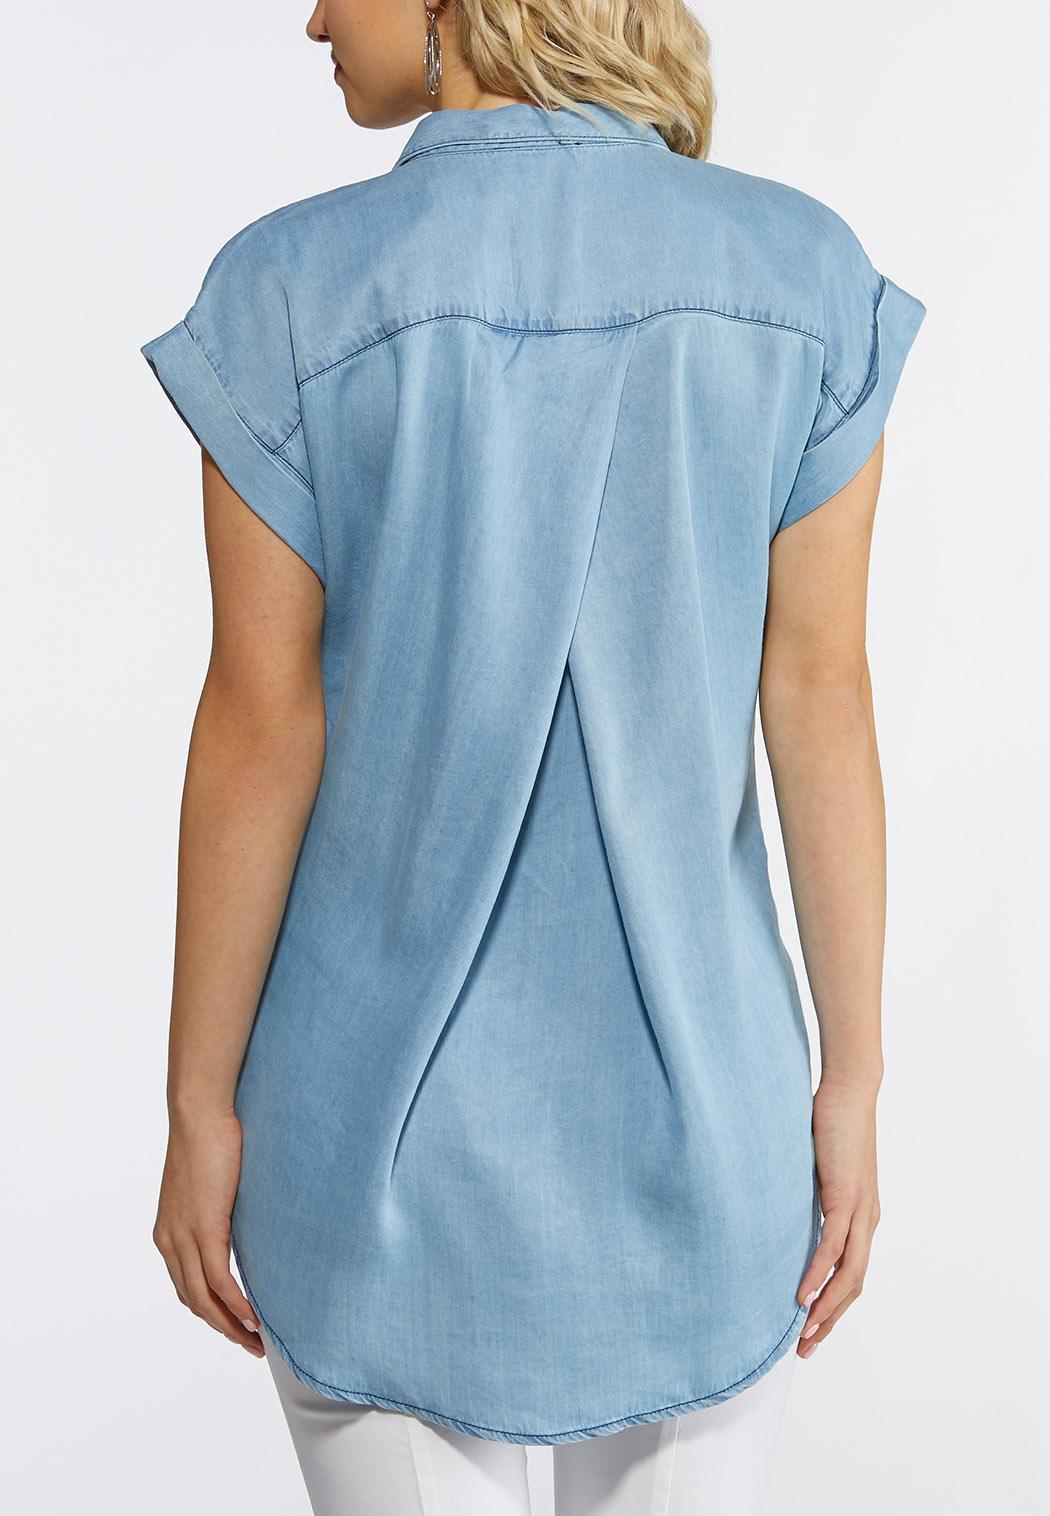 Button Down Chambray Shirt (Item #43744113)